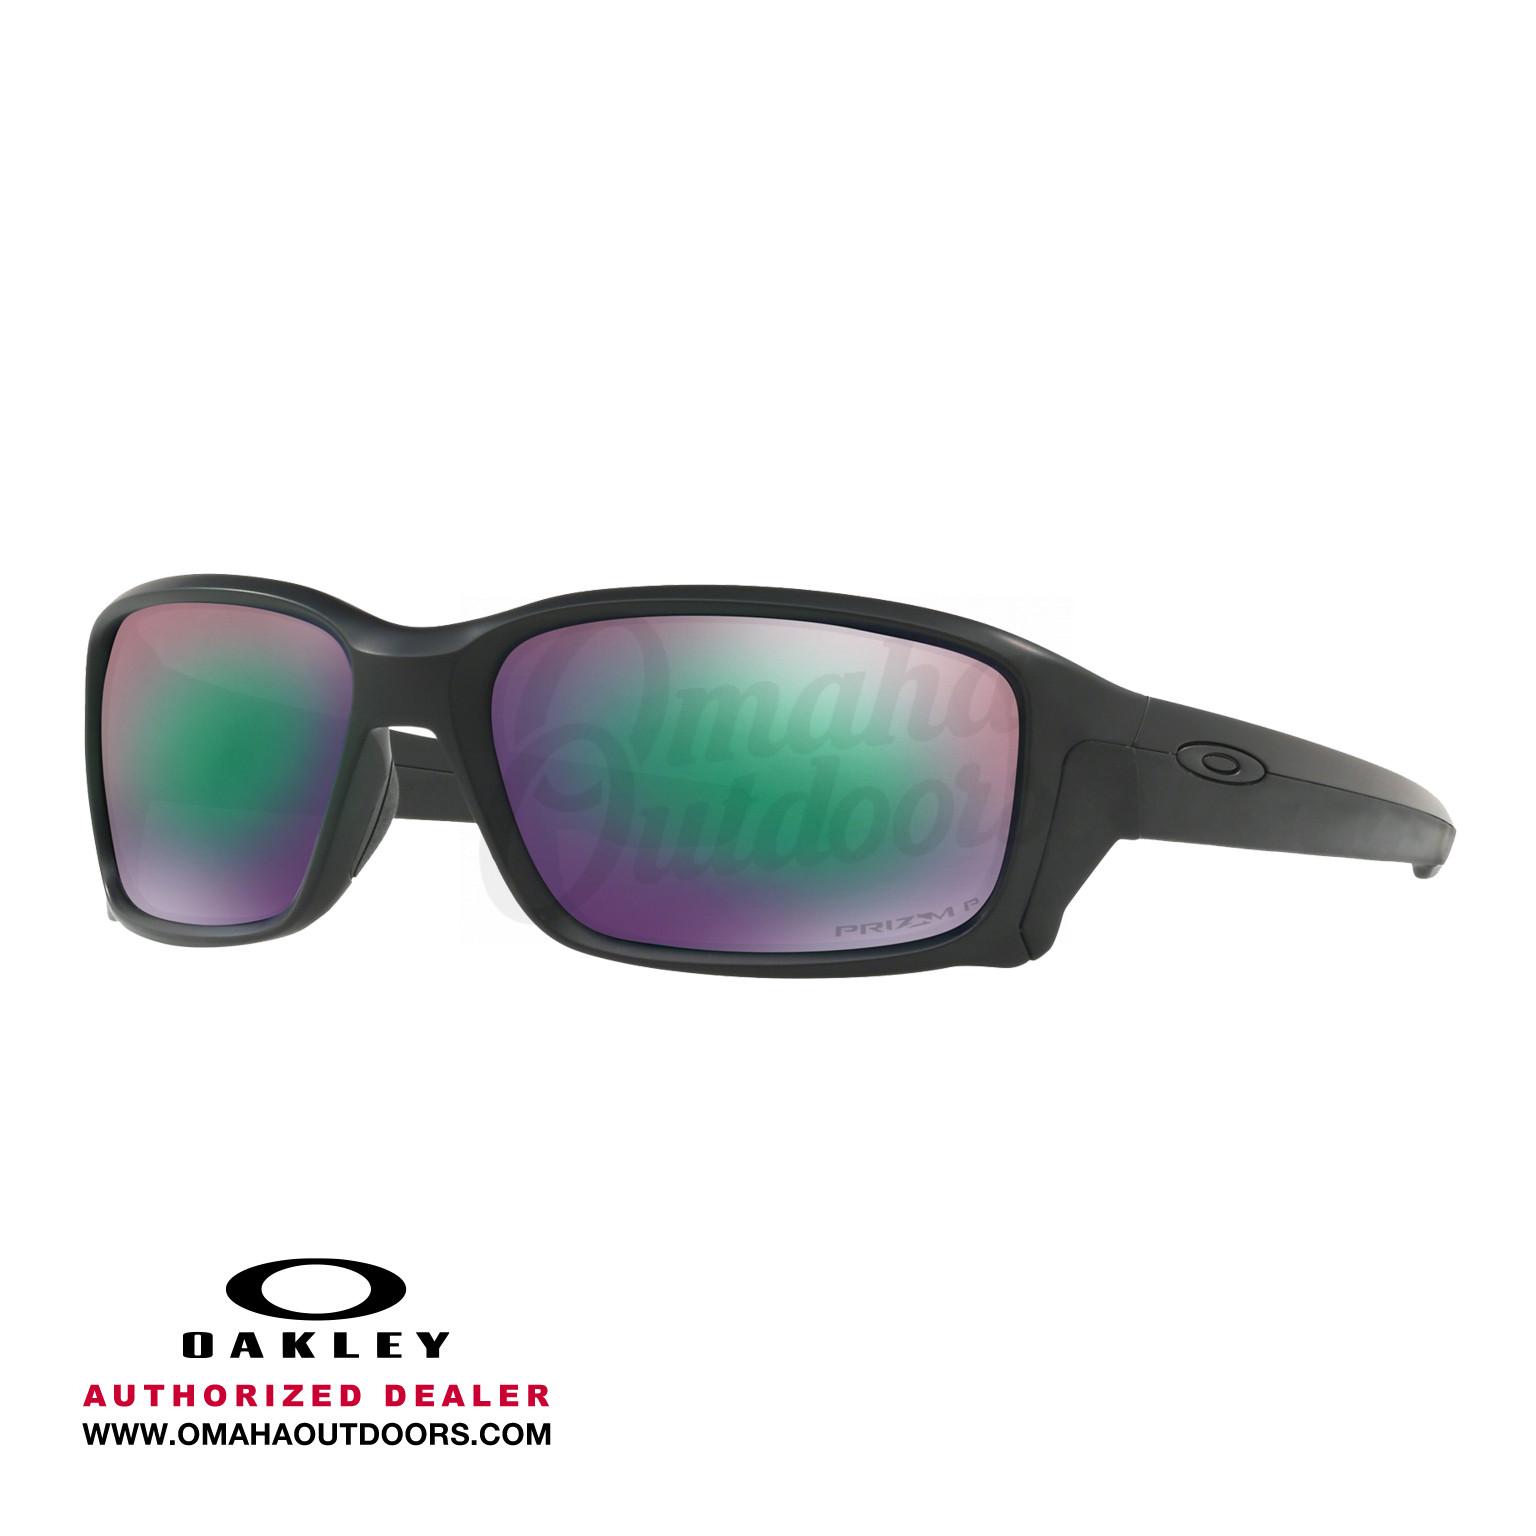 e892d78abc ... ireland oakley si straightlink sunglasses prizm maritime polarized lens  oo9331 10 515a0 cae30